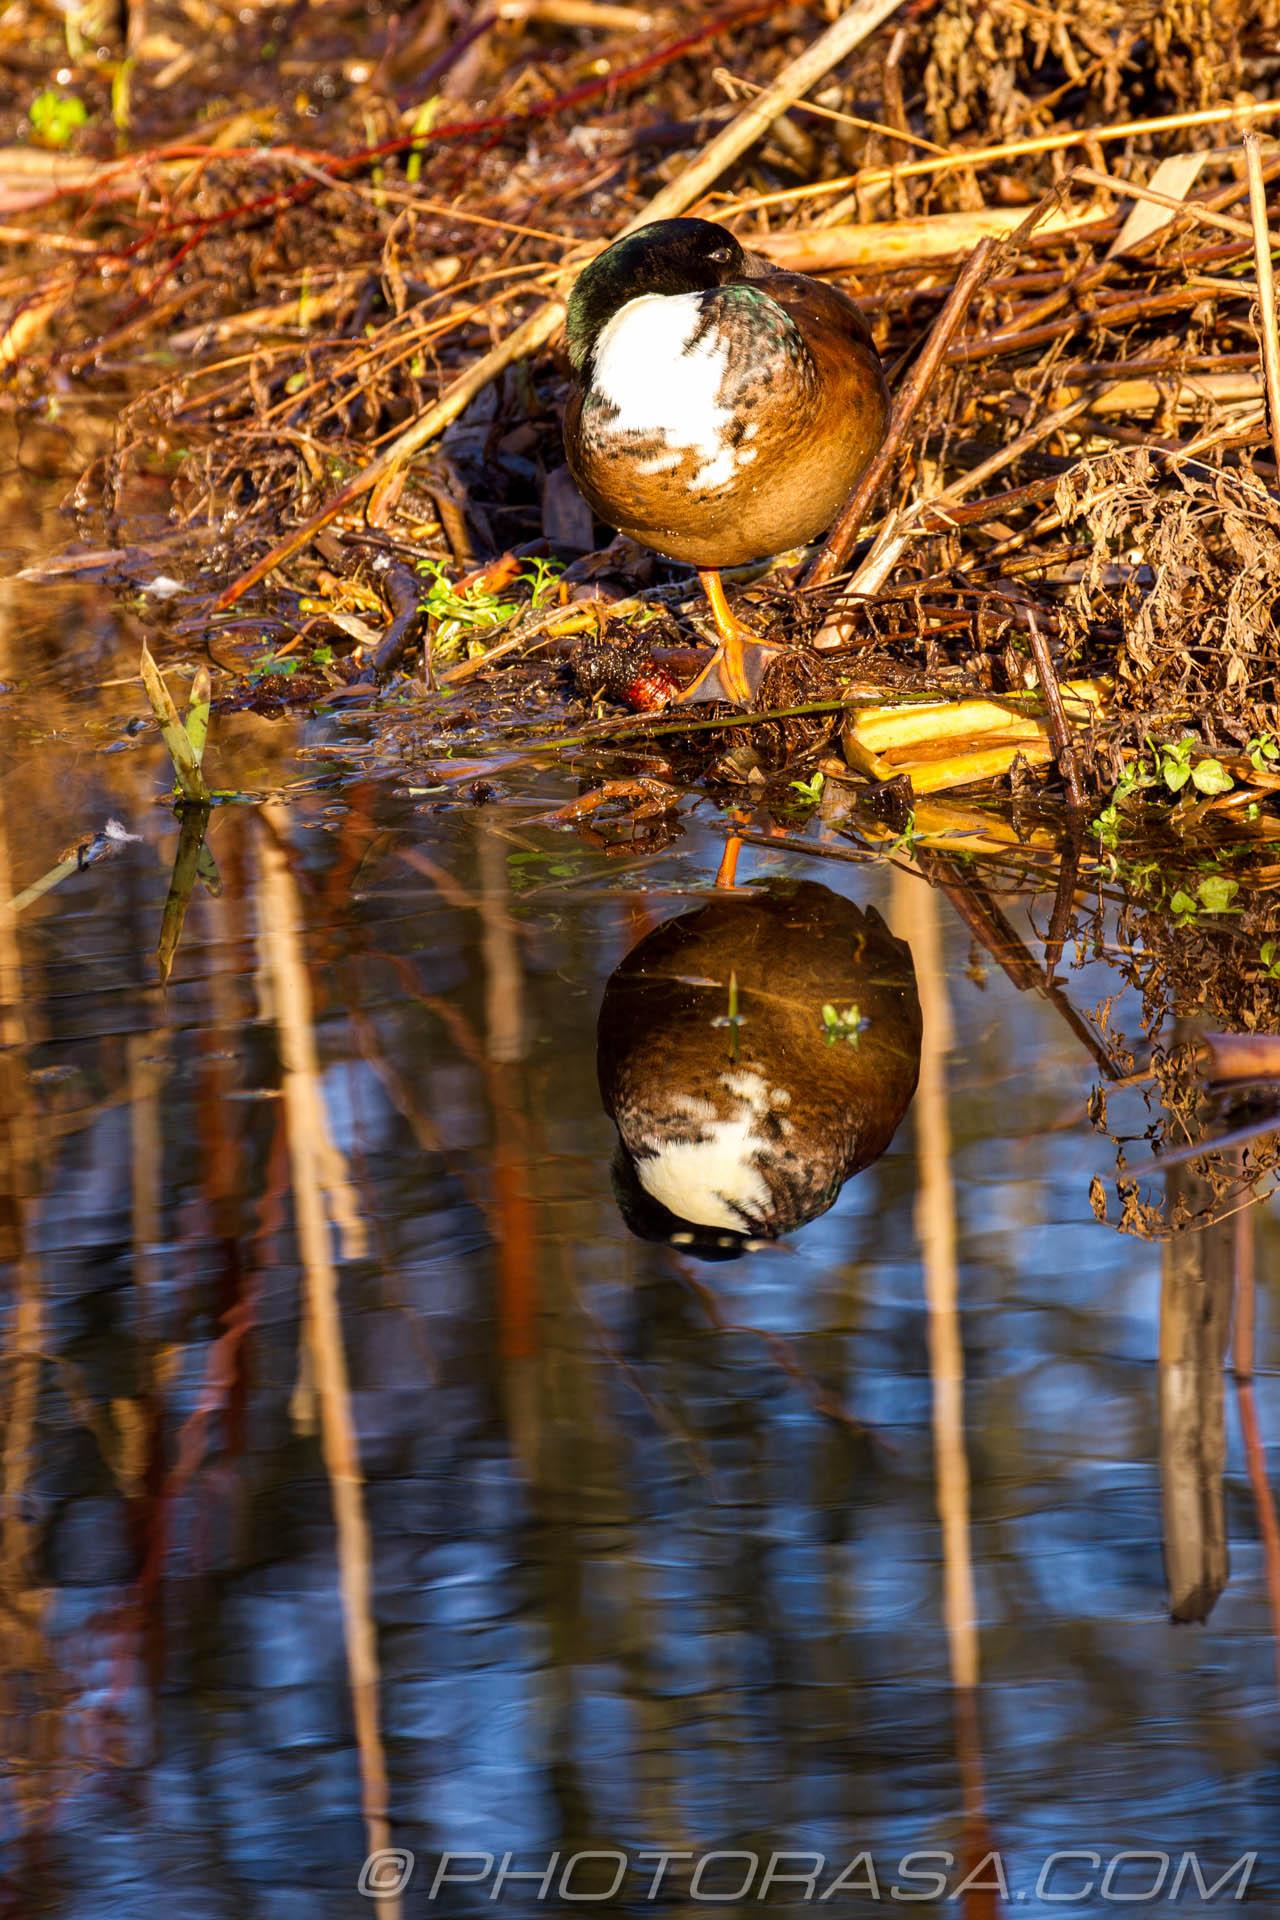 http://photorasa.com/ducks-bullrushes/white-breasted-drake-reflected-in-water/